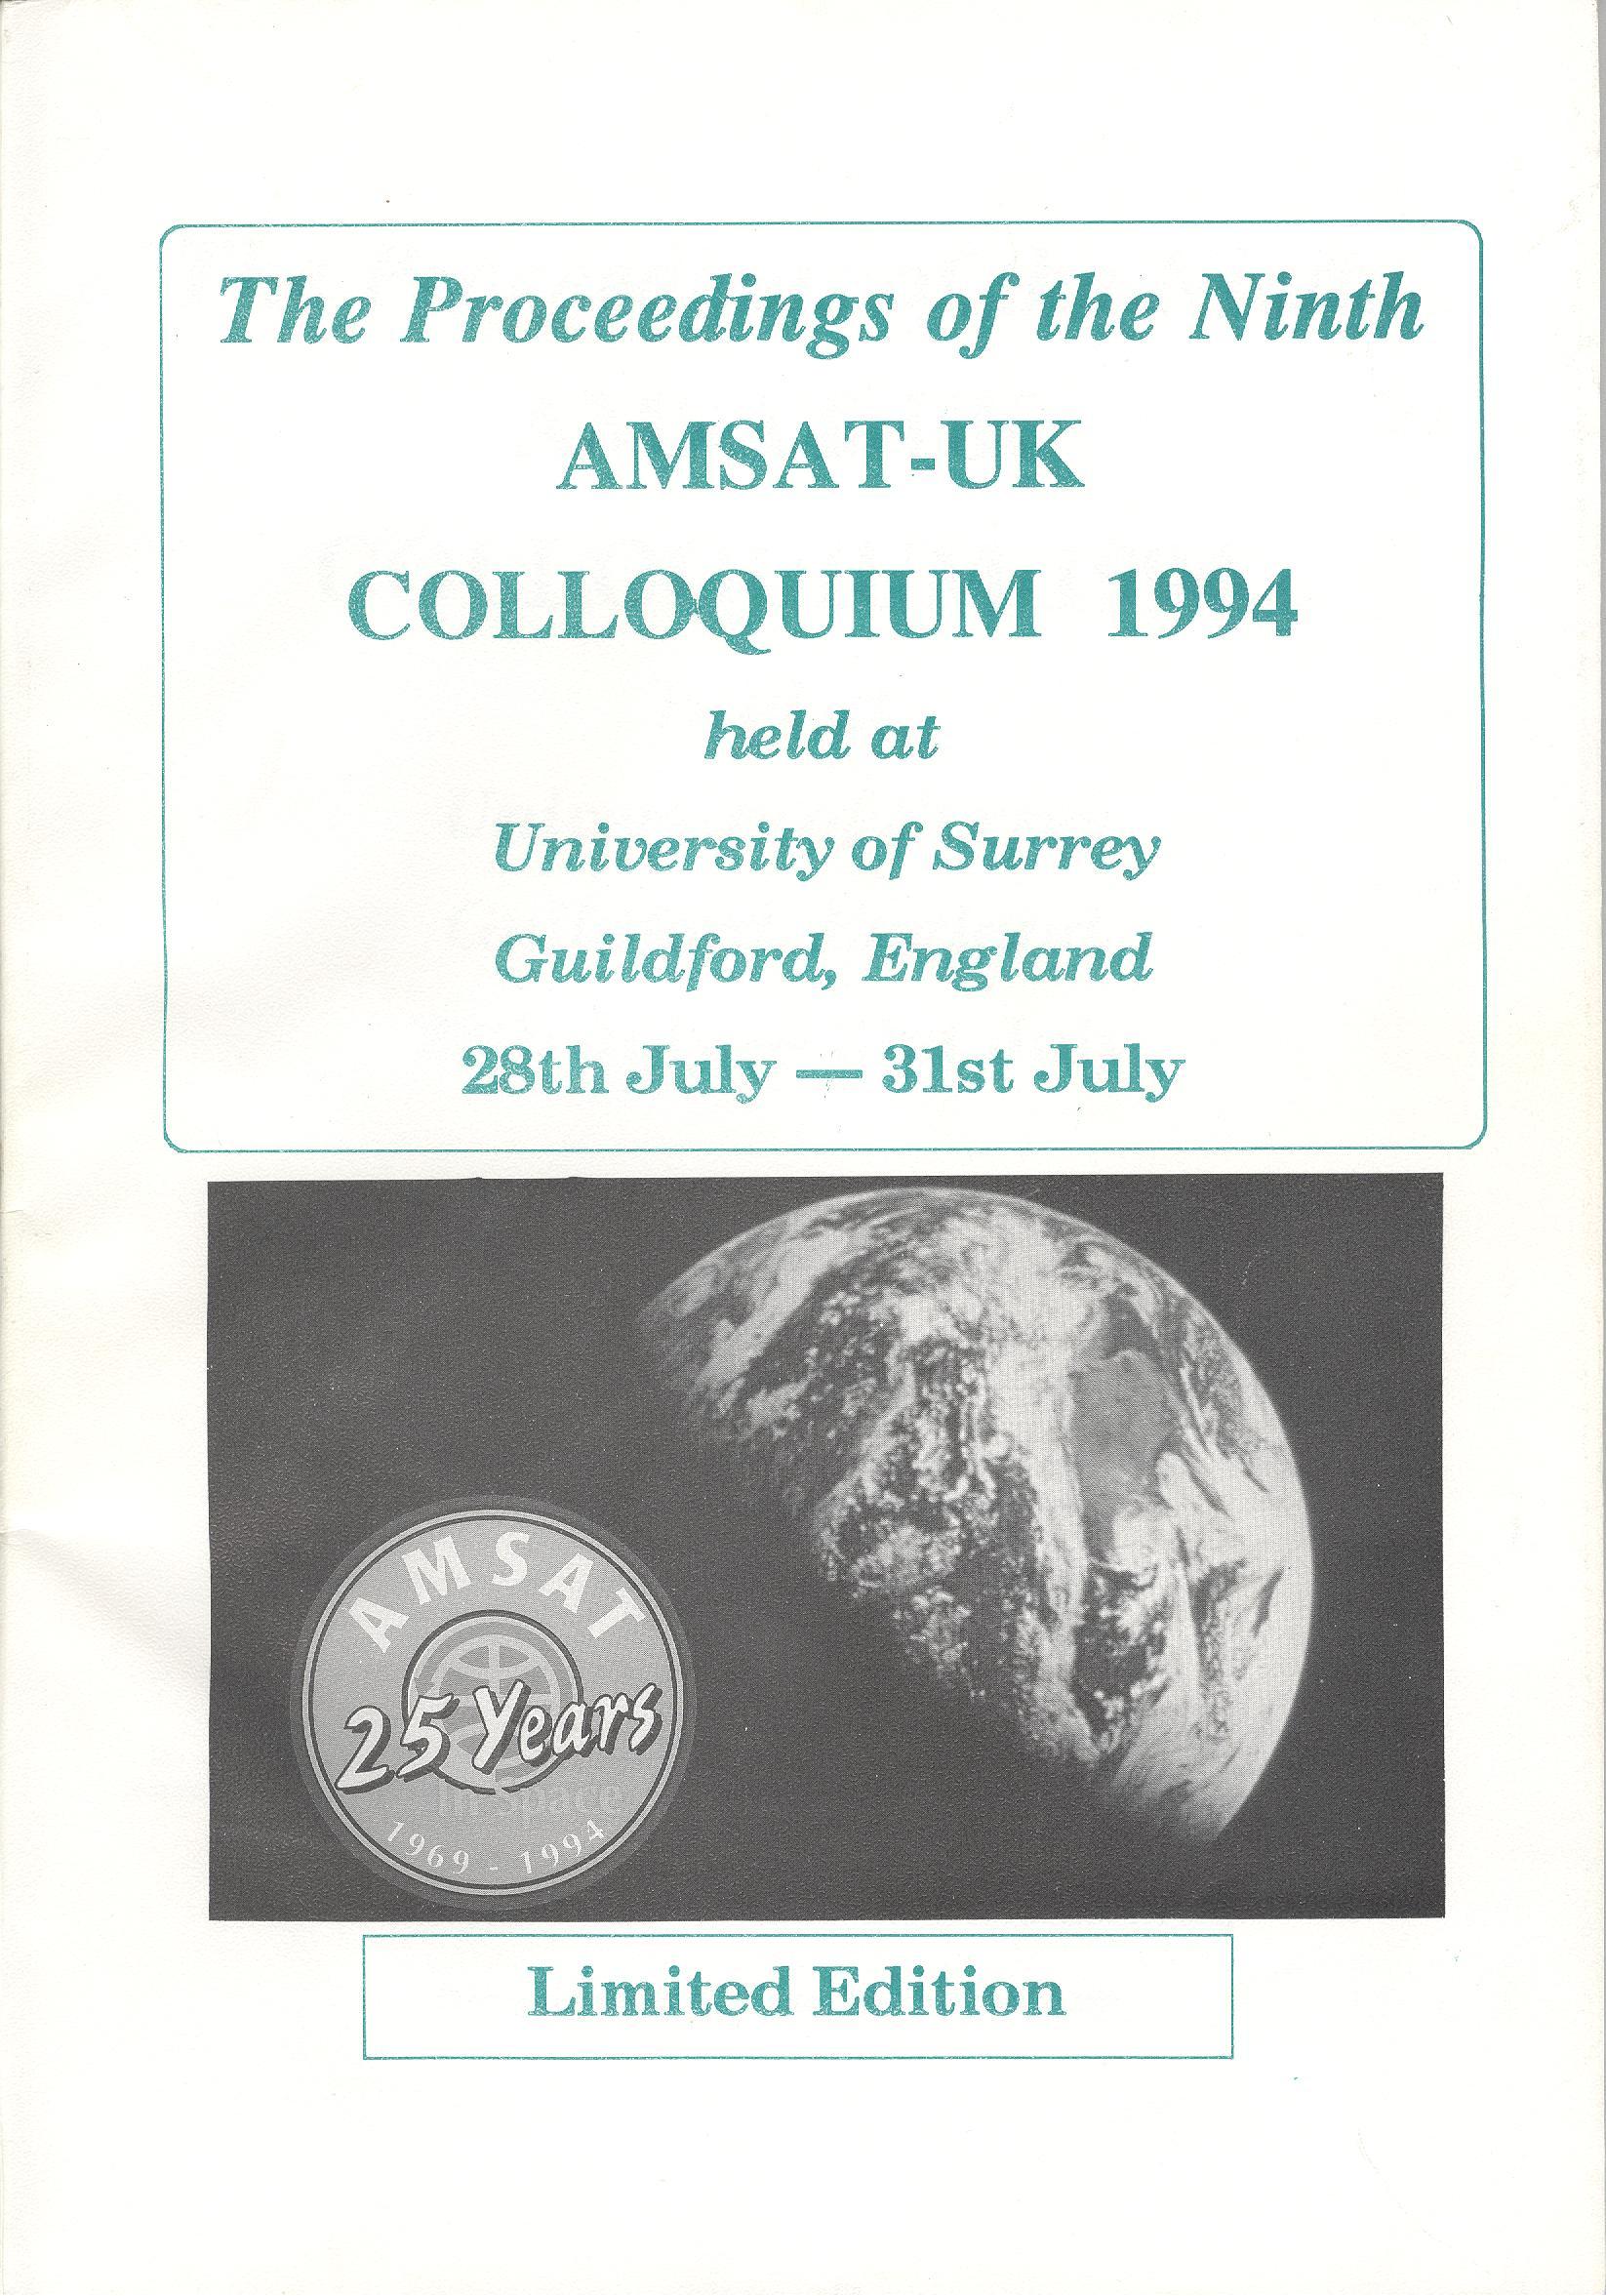 The Proceedings of he Ninth AMSAT-UK Colloquium 1994